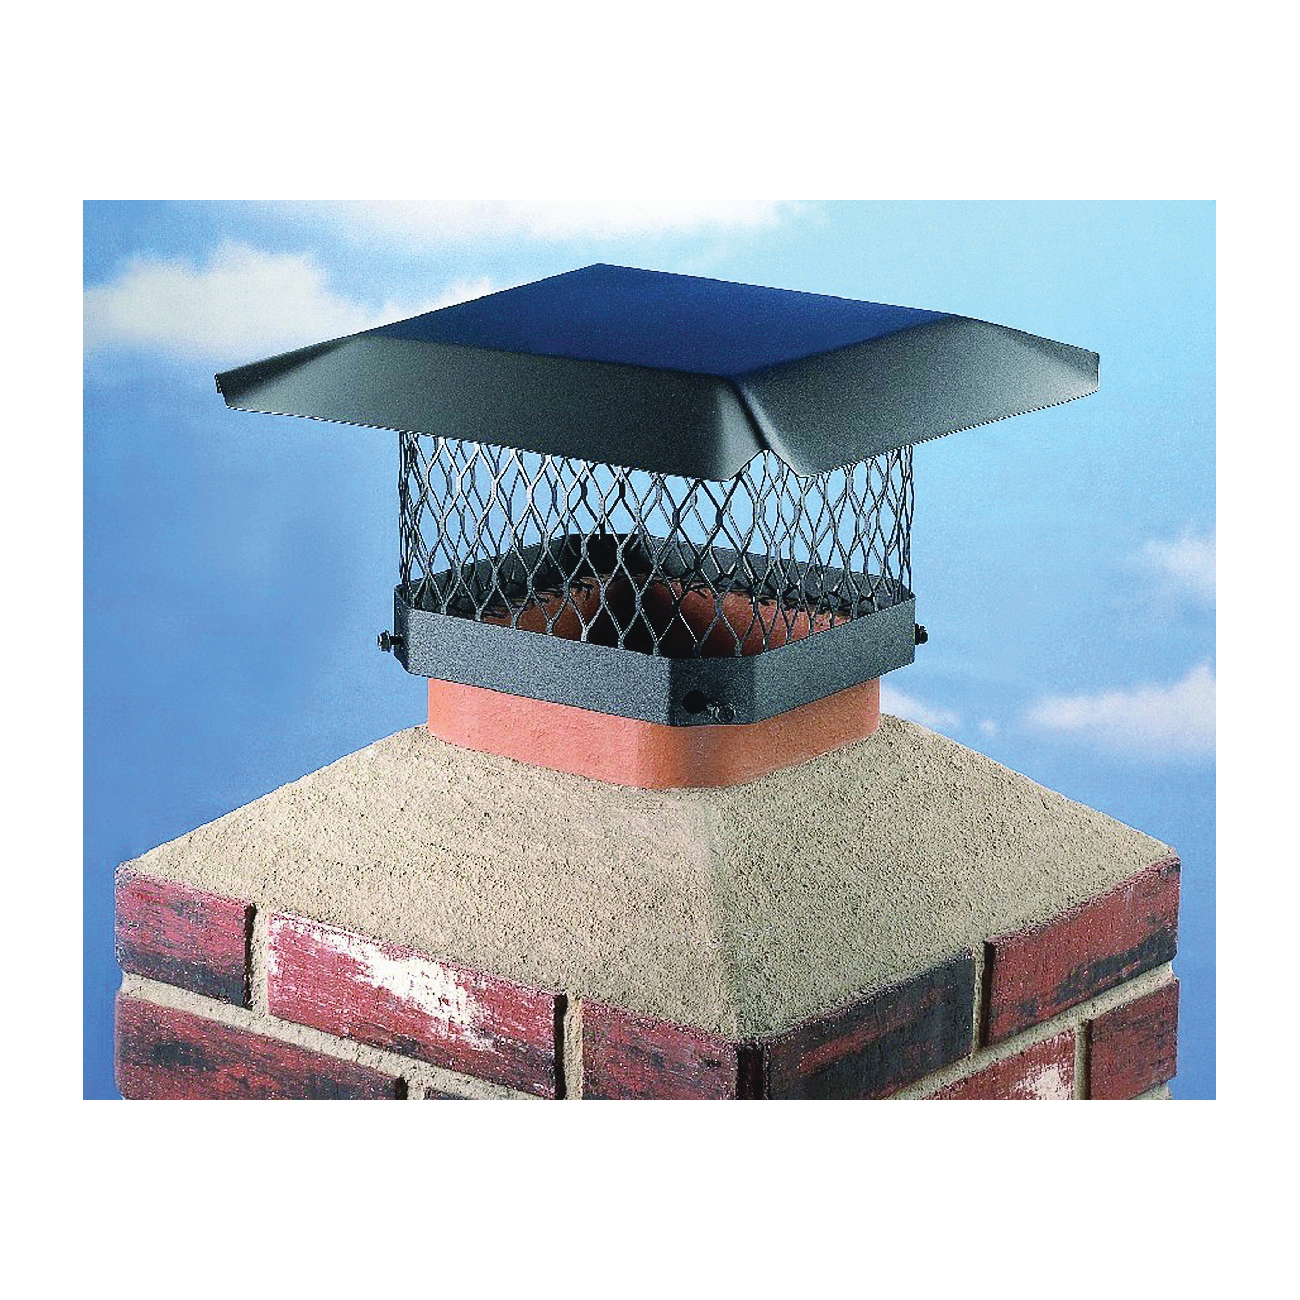 Picture of SHELTER SC1318 Shelter Chimney Cap, Steel, Black, Powder-Coated